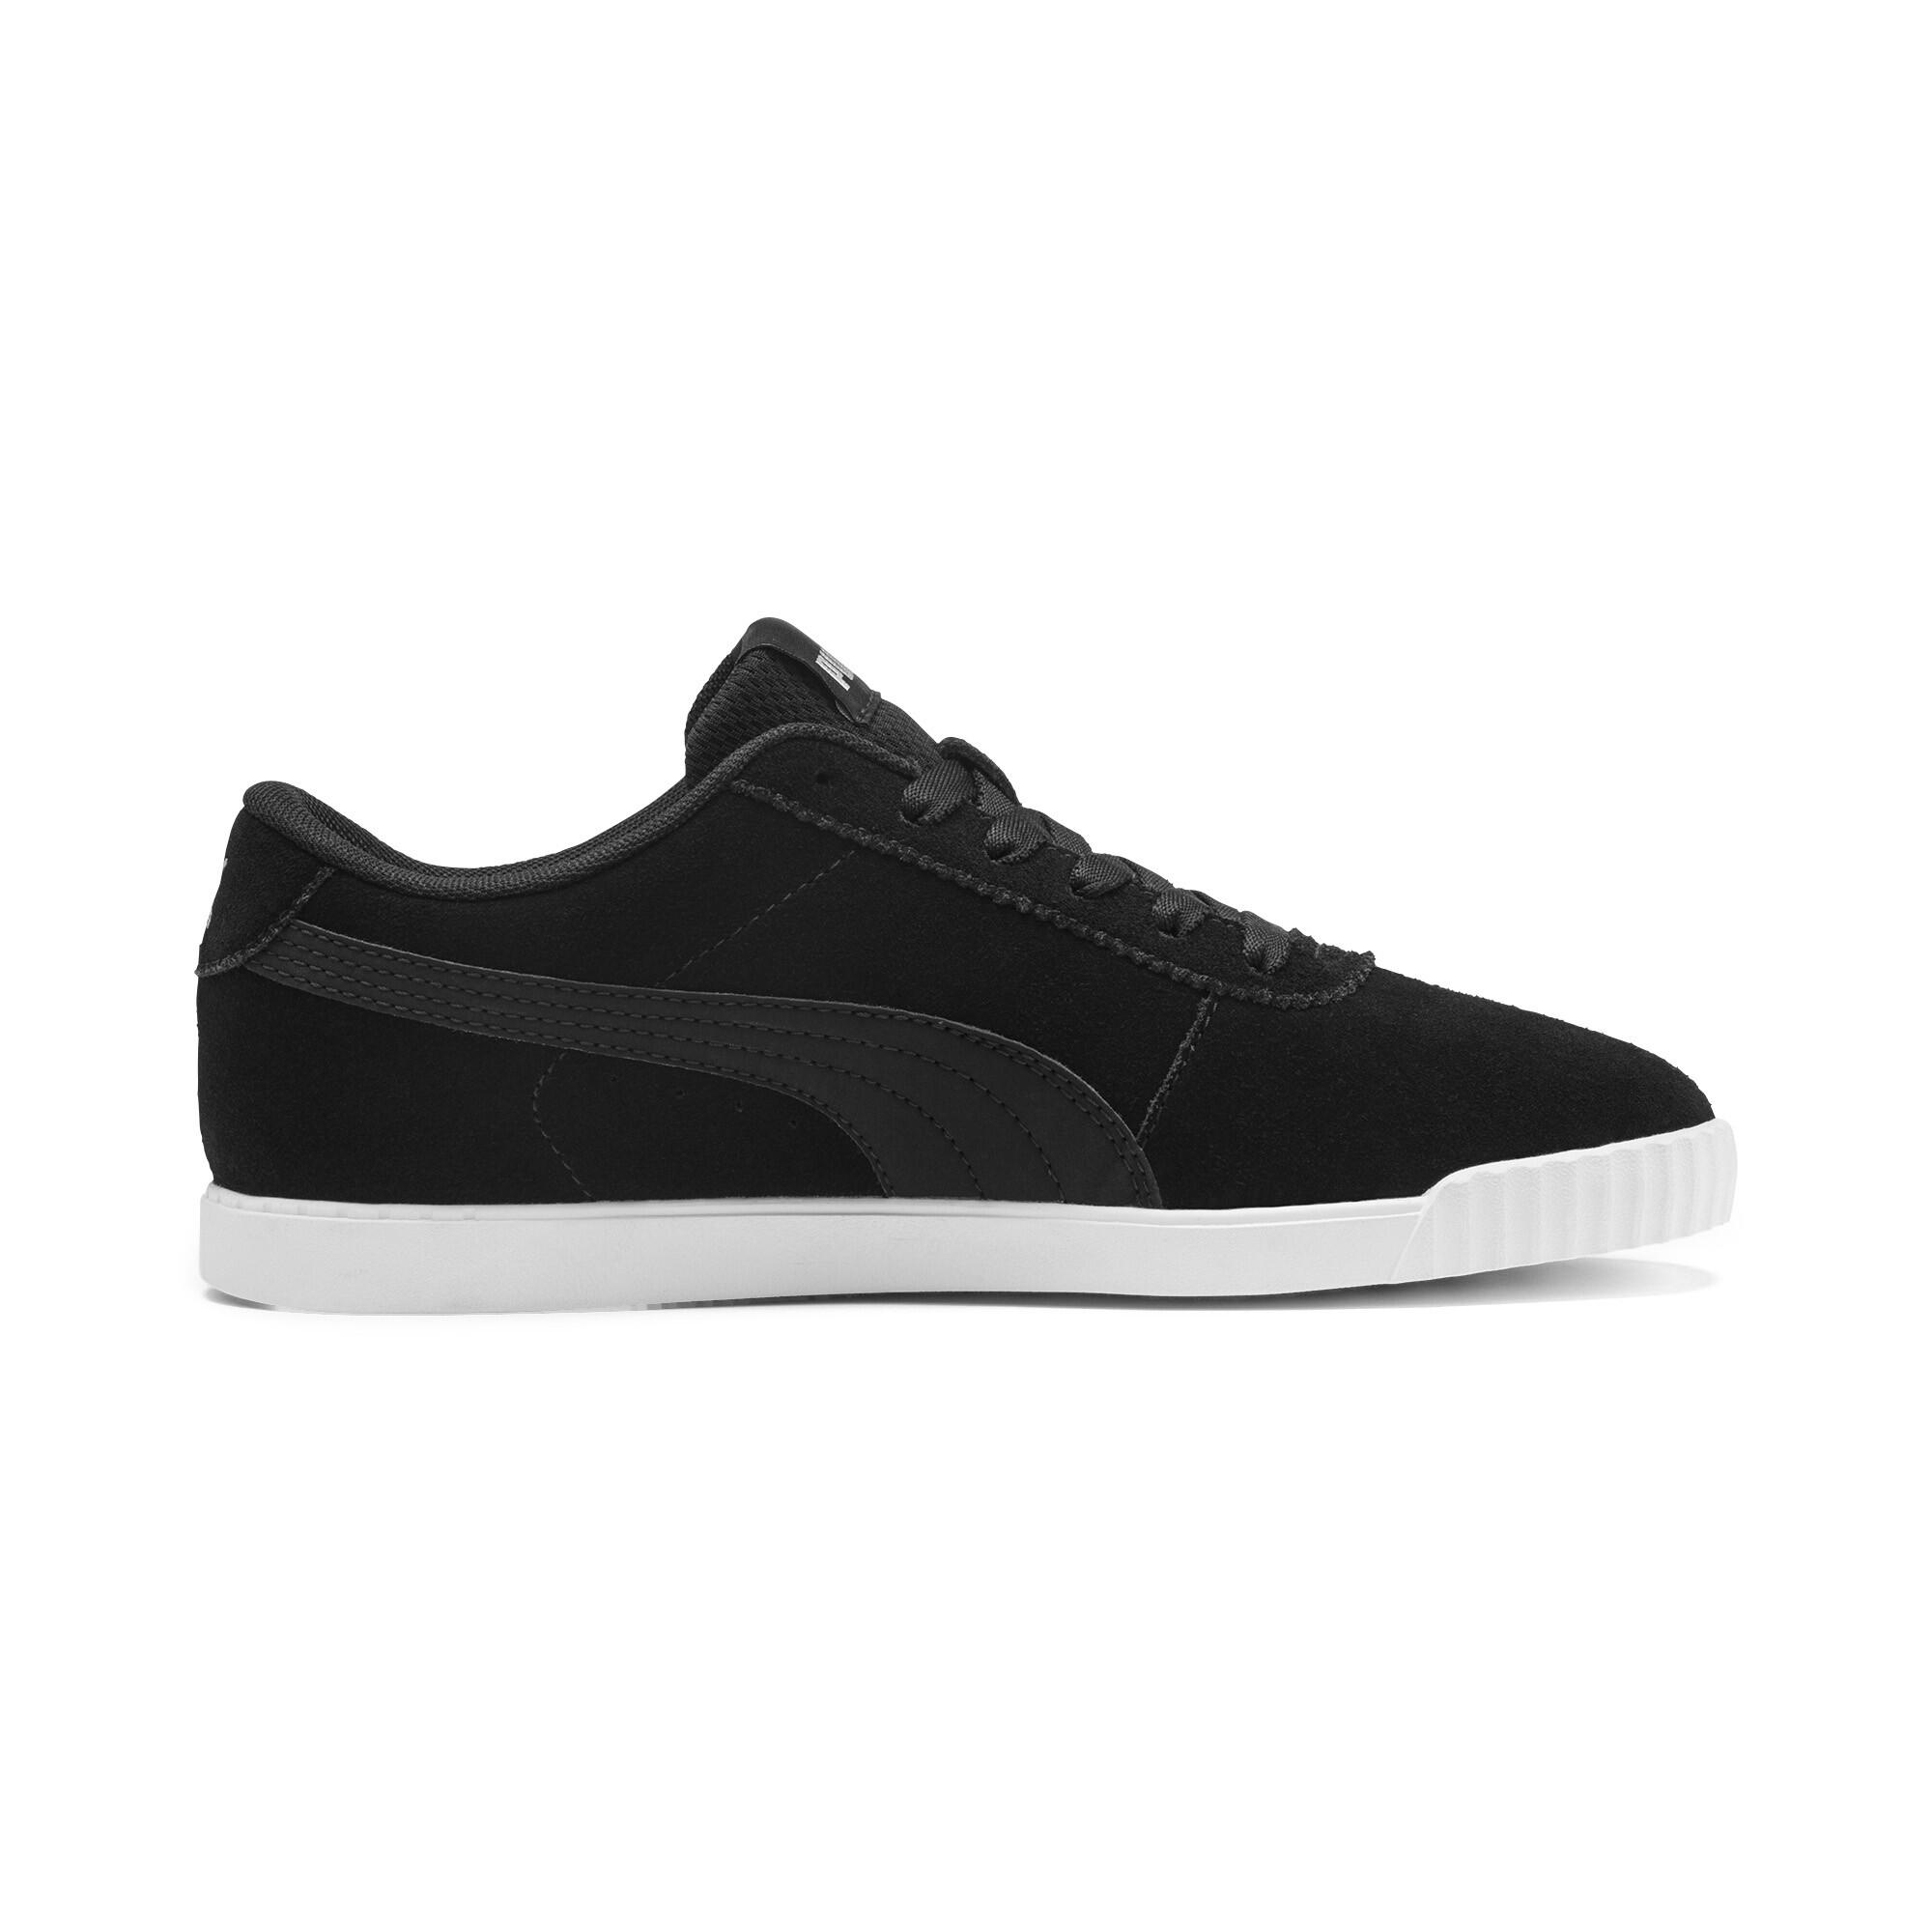 PUMA-Women-039-s-Carina-Slim-Suede-Sneakers thumbnail 21